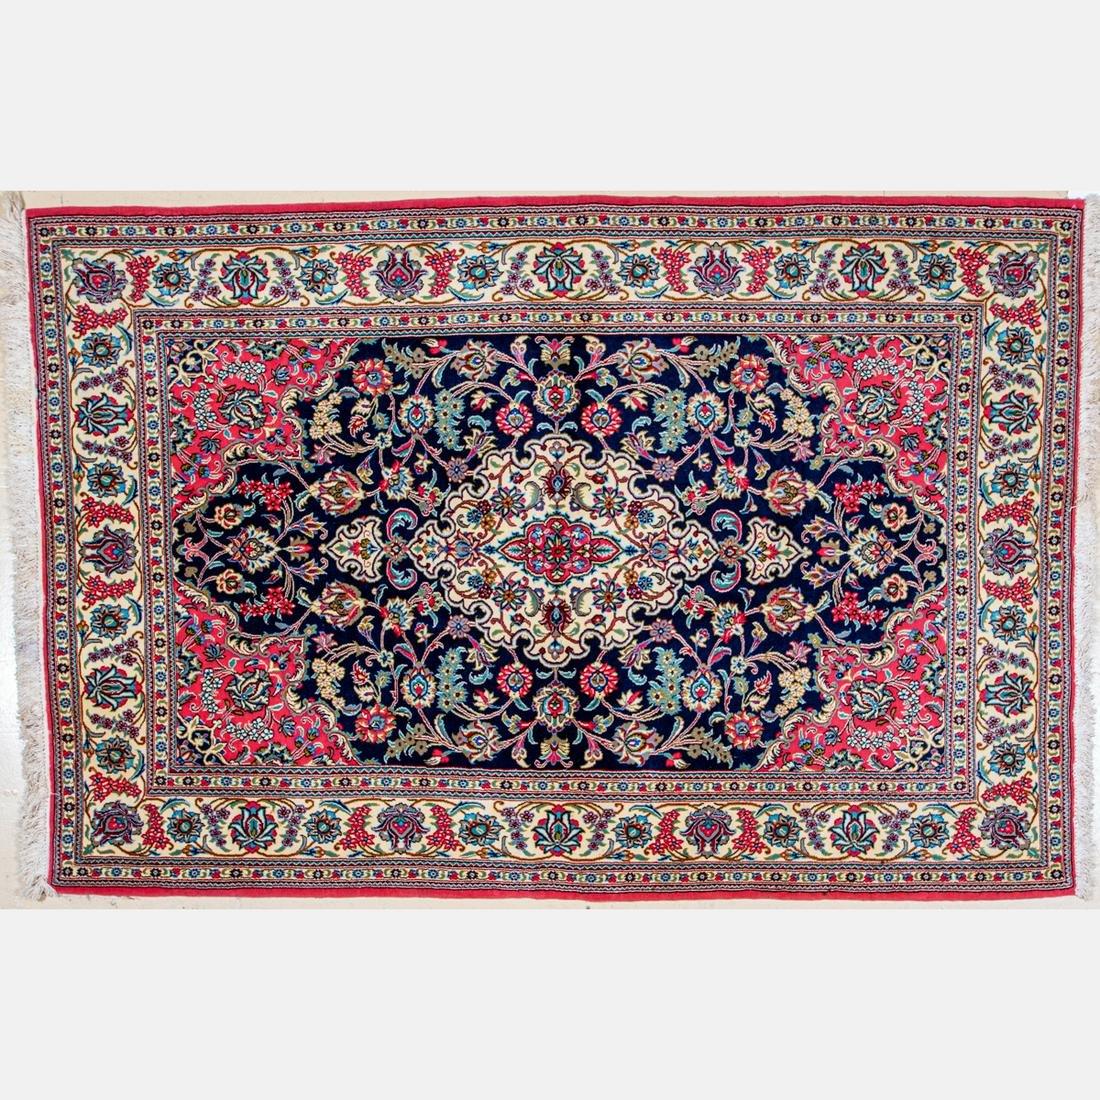 A Fine Persian Wool Rug,